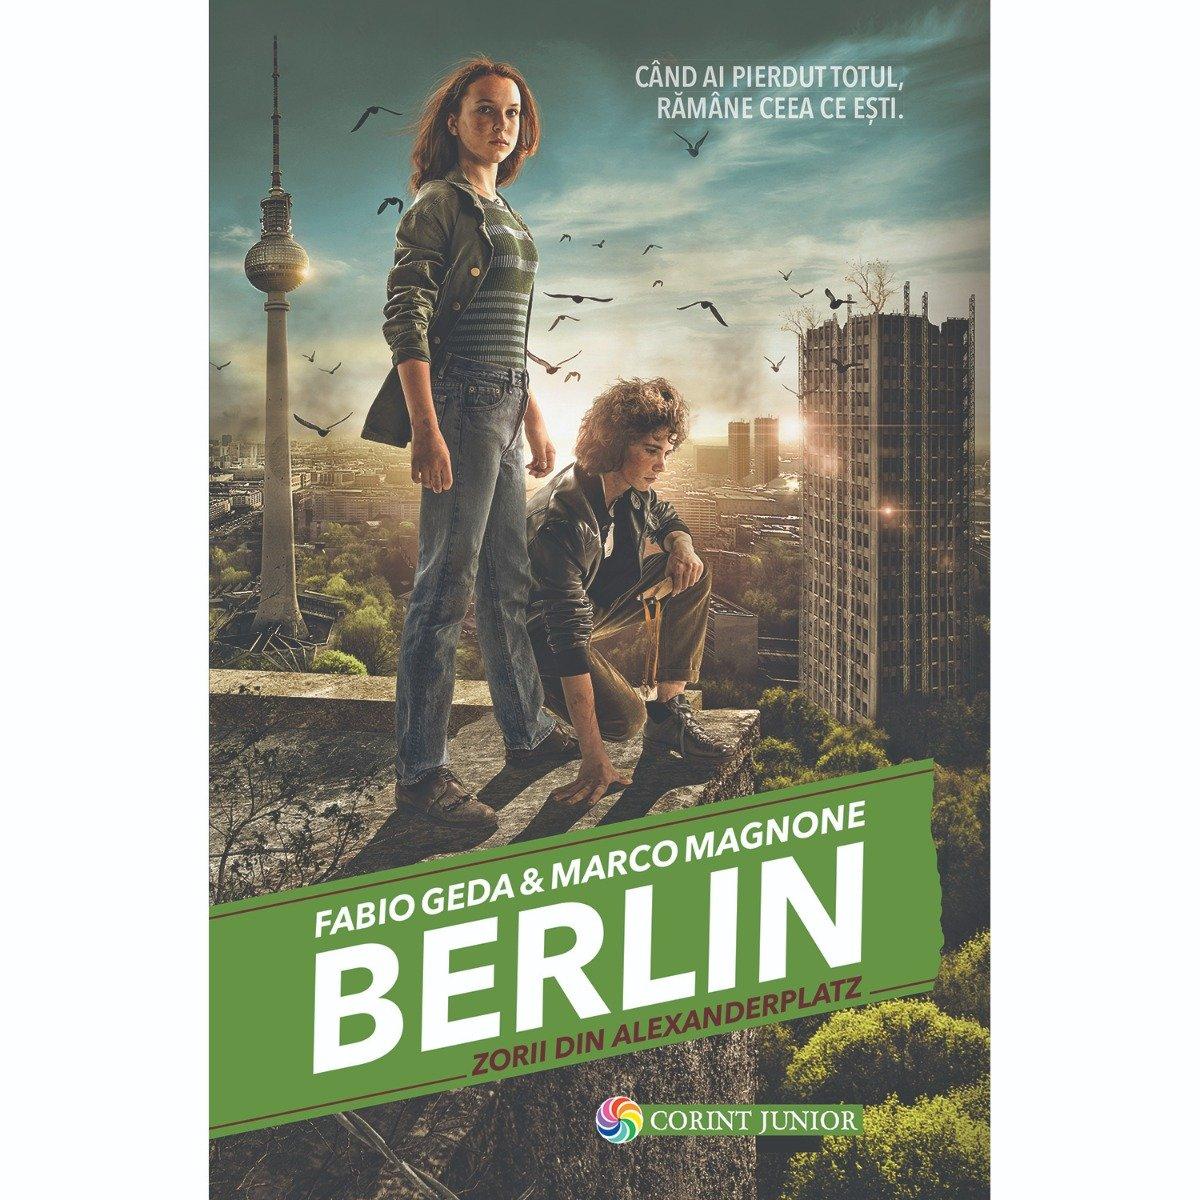 Carte Editura Corint, Berlin vol.II Zorii din Alexanderplatz, Fabio Geda, Marco Magnone